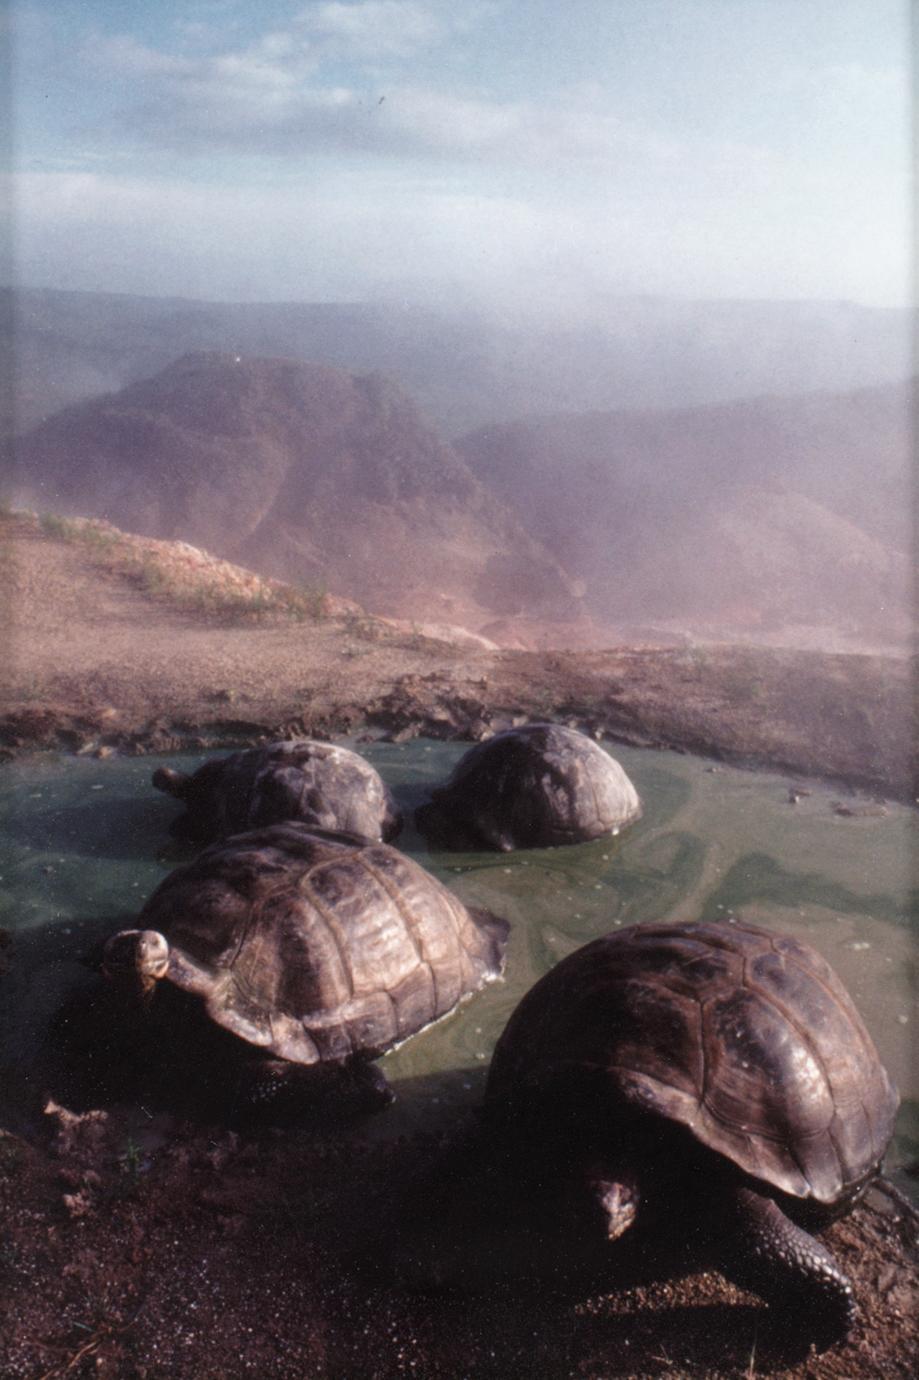 Galápagos Tortoises (Geochelone elephantopus vandenburghi)